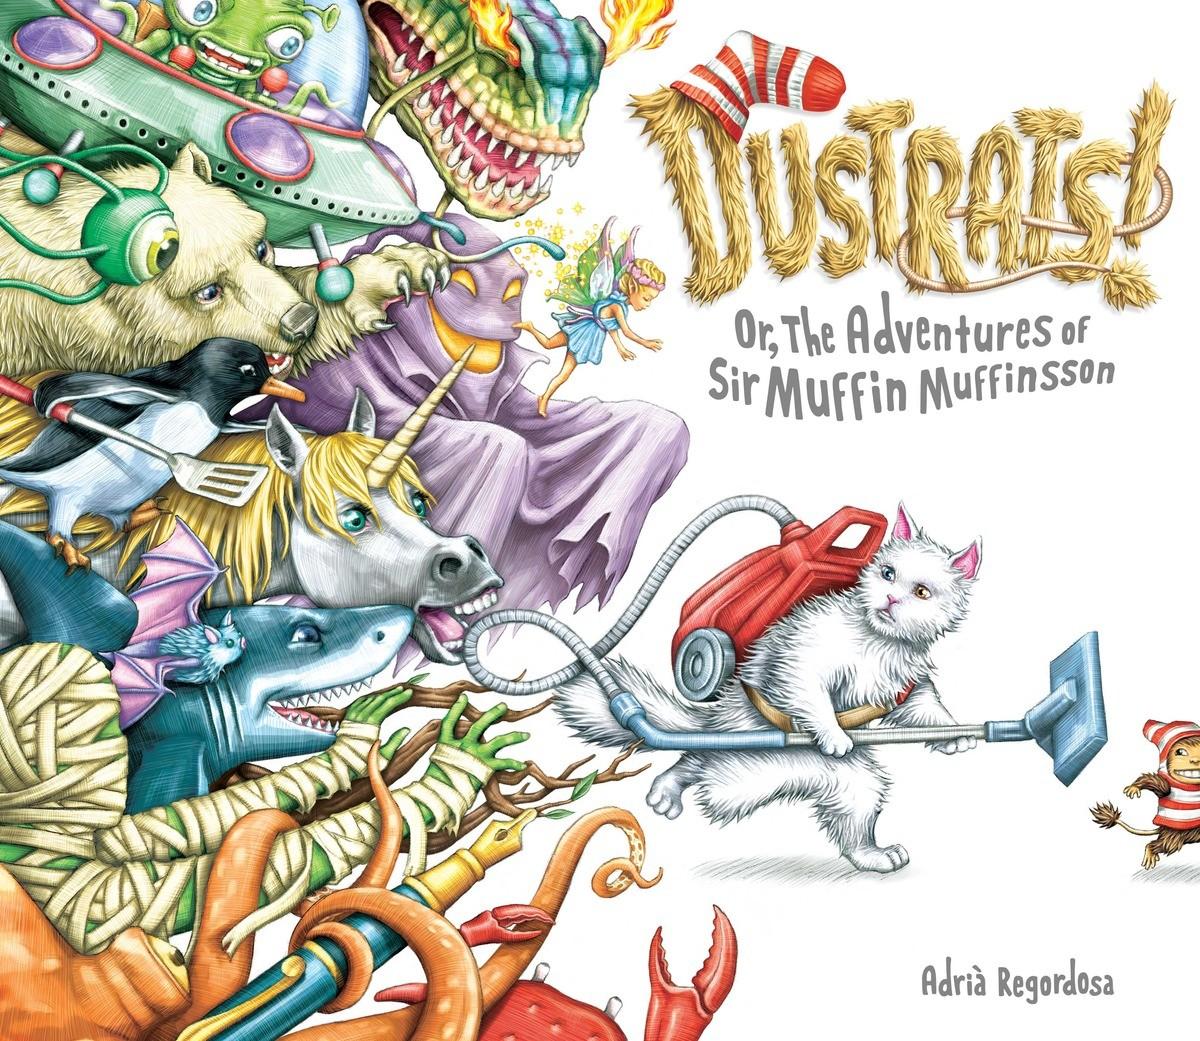 POW! Sunday Story Time with Adrià Regordosa (Author & Illustrator of Dustrats!)